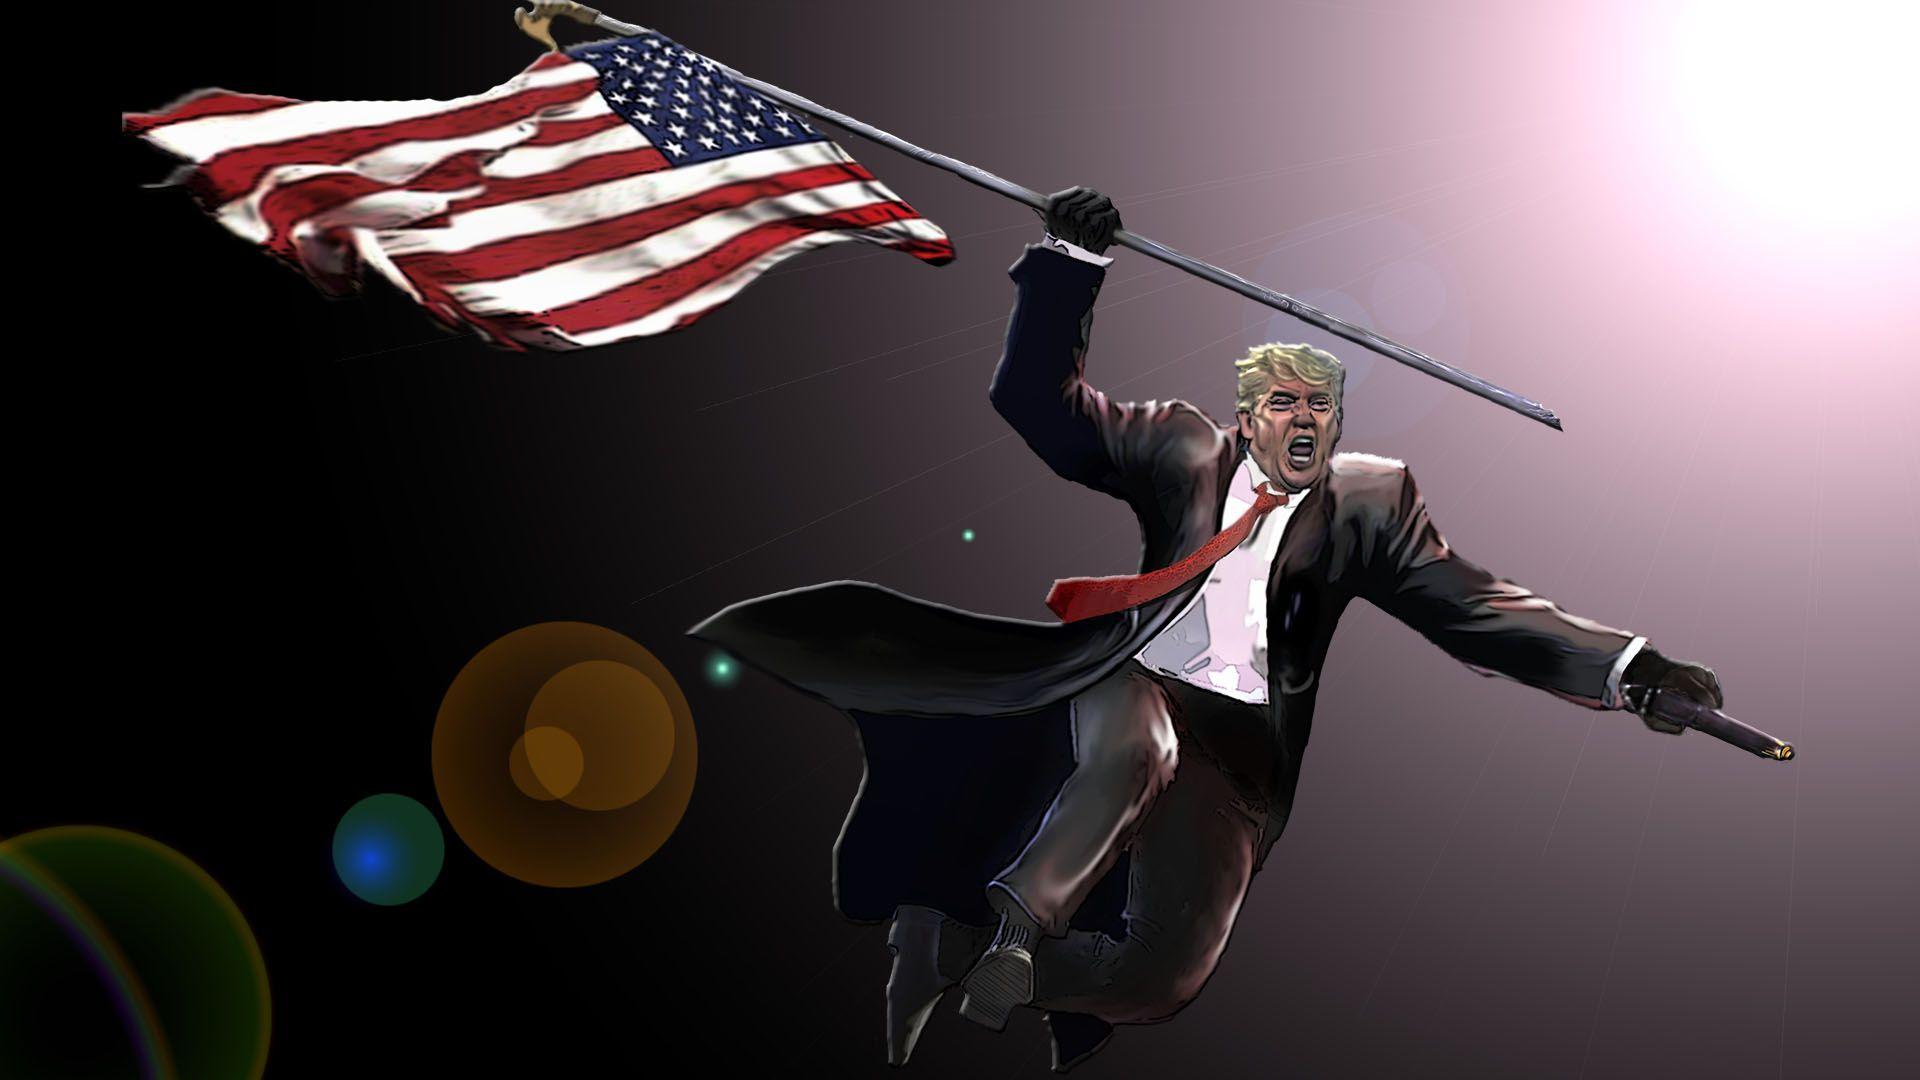 Make America Great Again The Trump Presidency